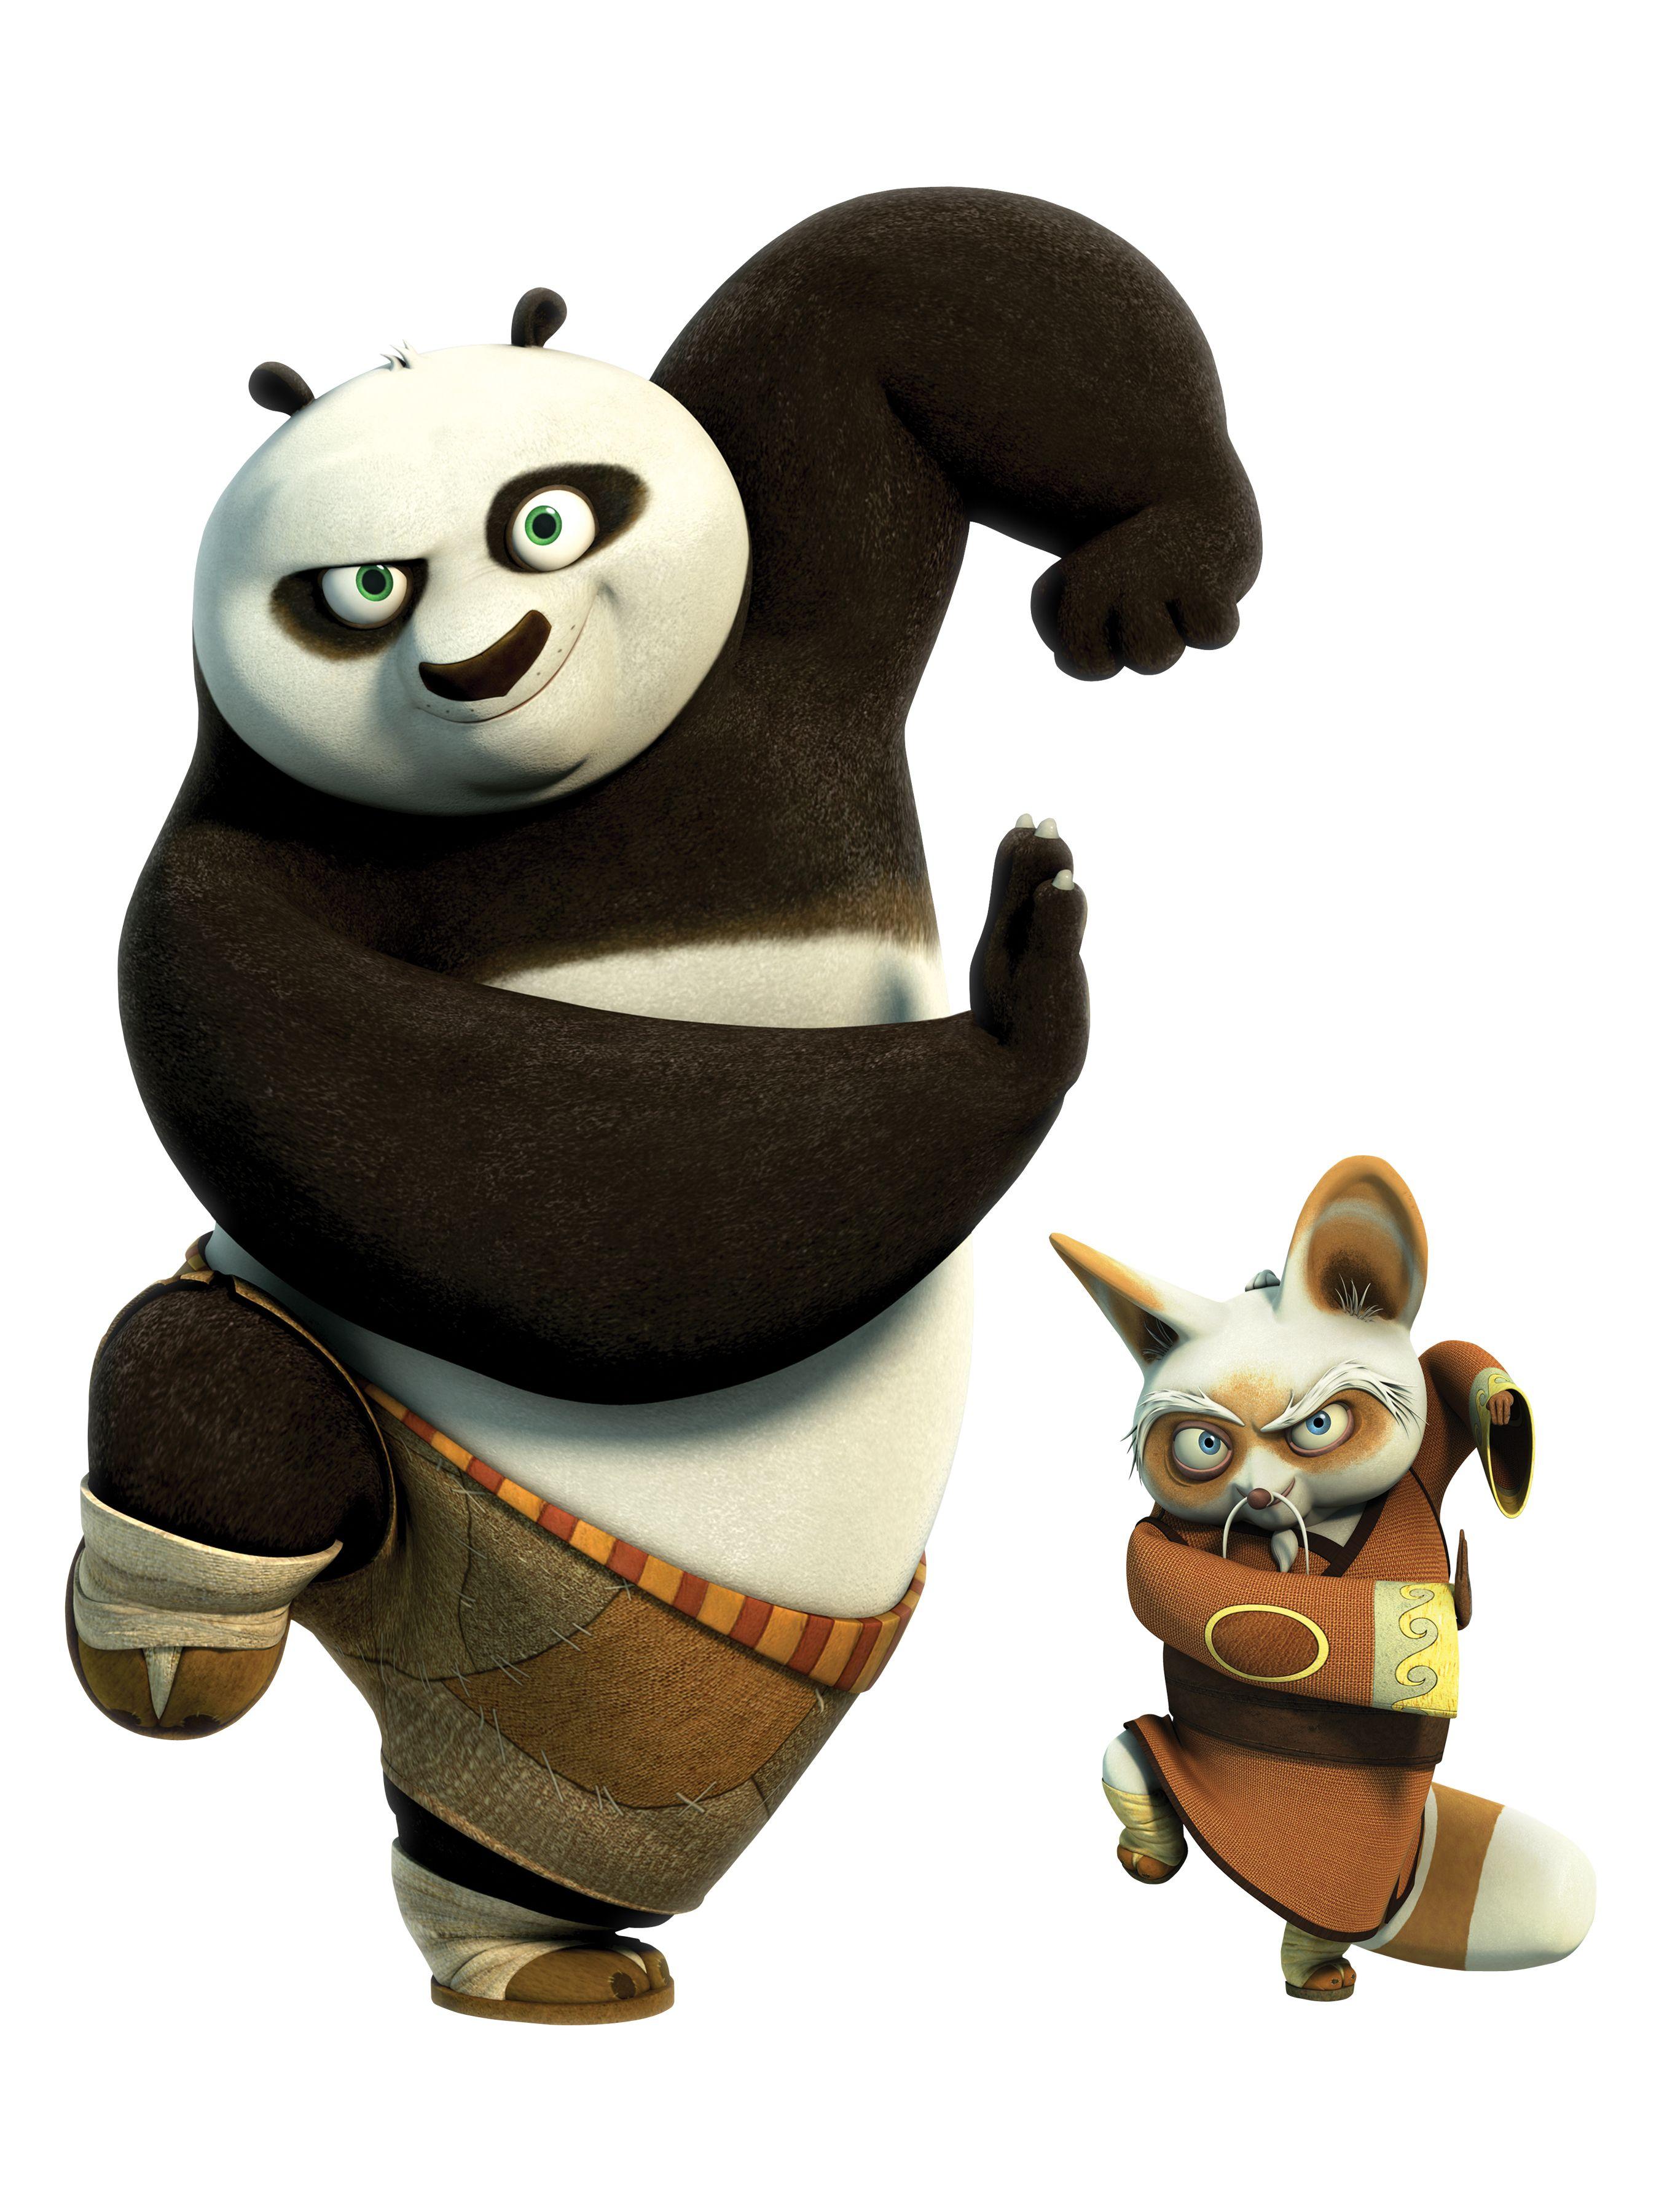 Http Vignette4 Wikia Nocookie Net Kungfupanda Images F F3 Poshifuloa Jpg Revision Latest Cb 20111107193505 Kung Fu Panda 3 Kung Fu Panda Kung Fu Panda Party